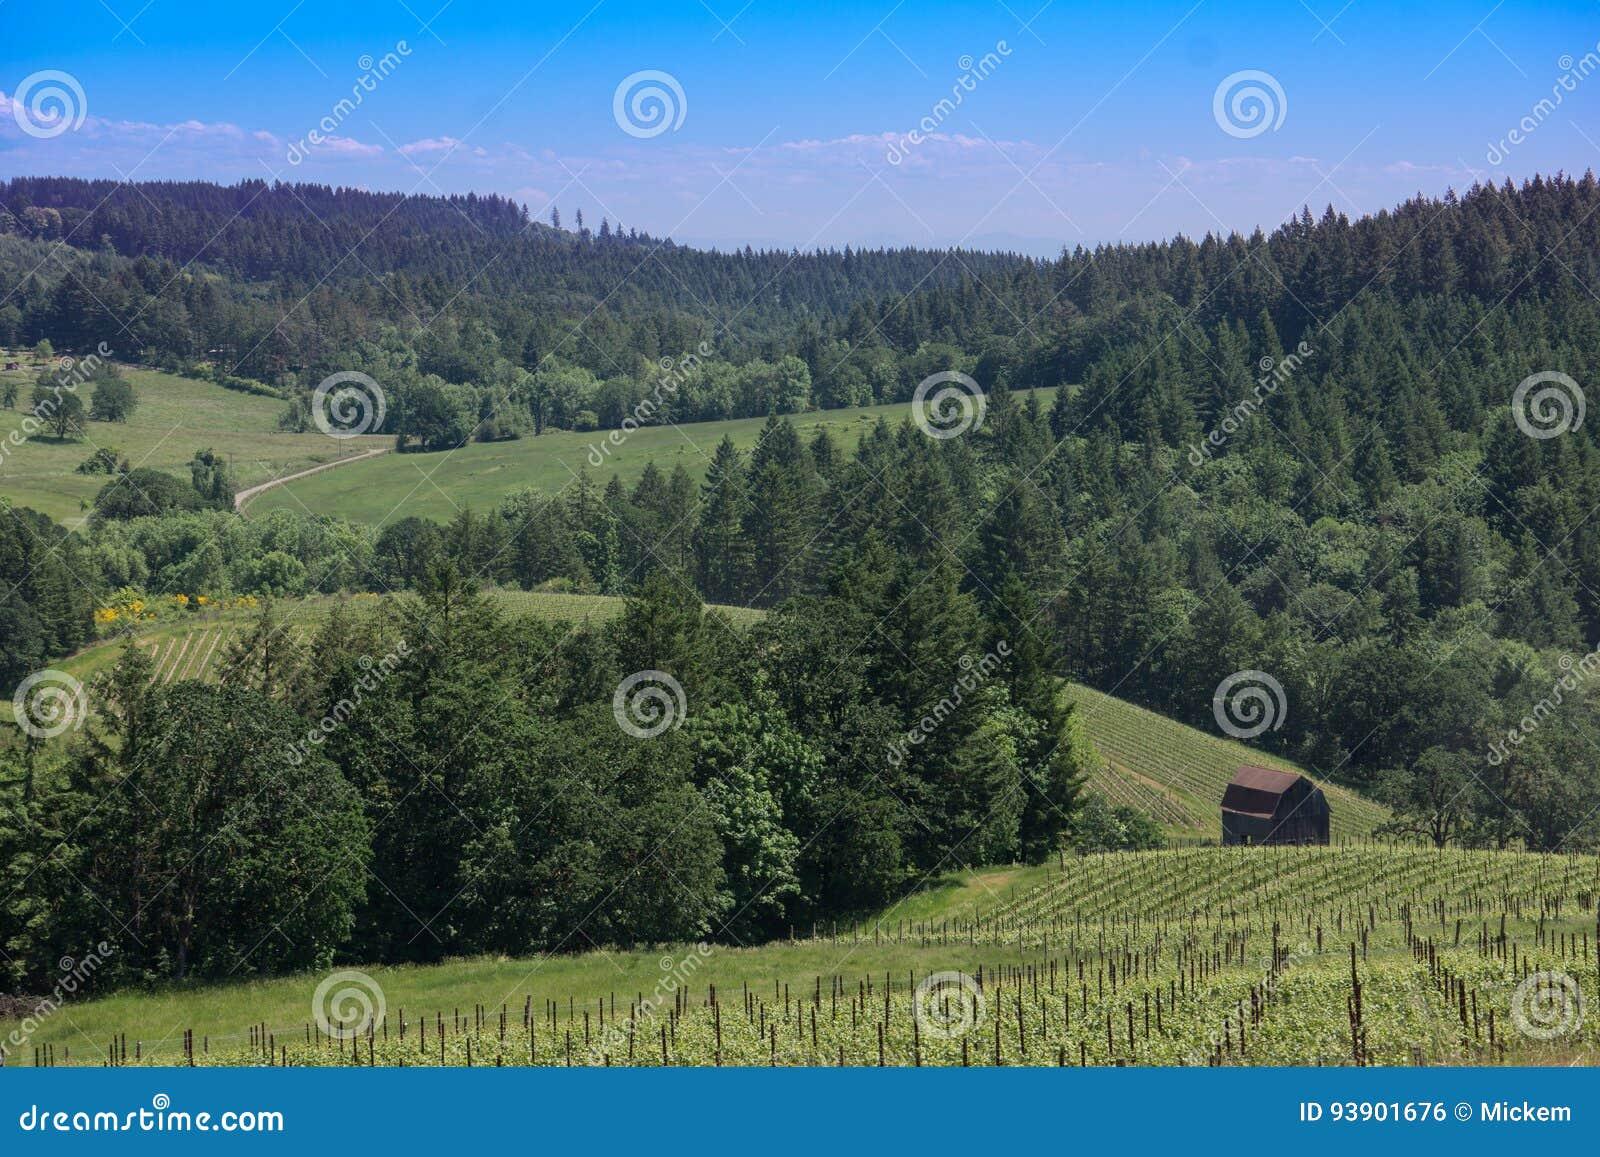 Oregon Wine Country Landscape